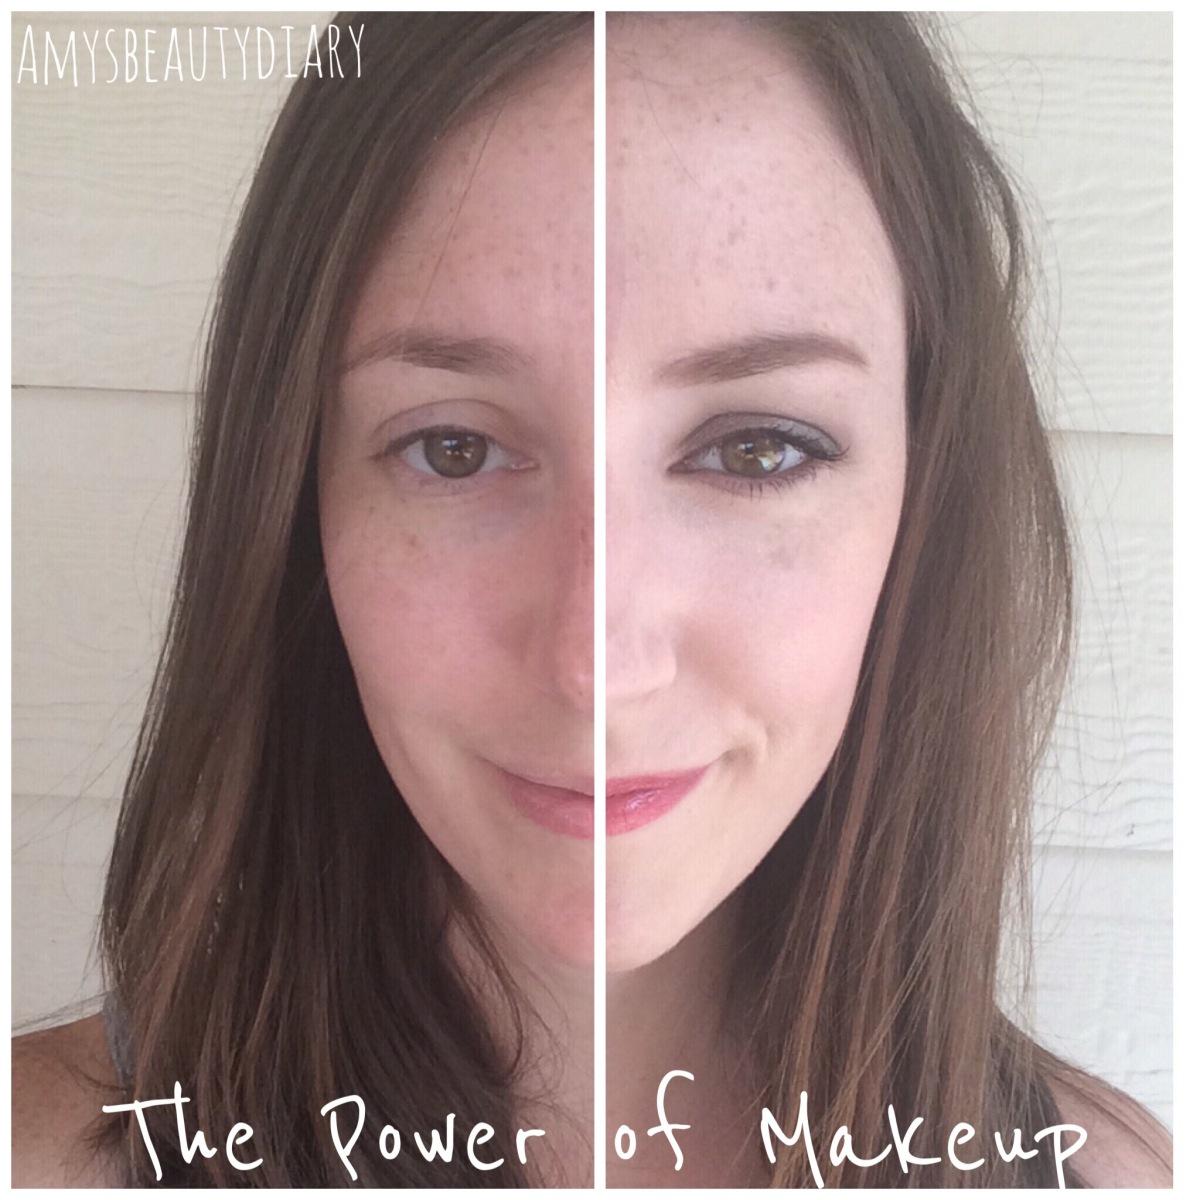 The Power ofMakeup